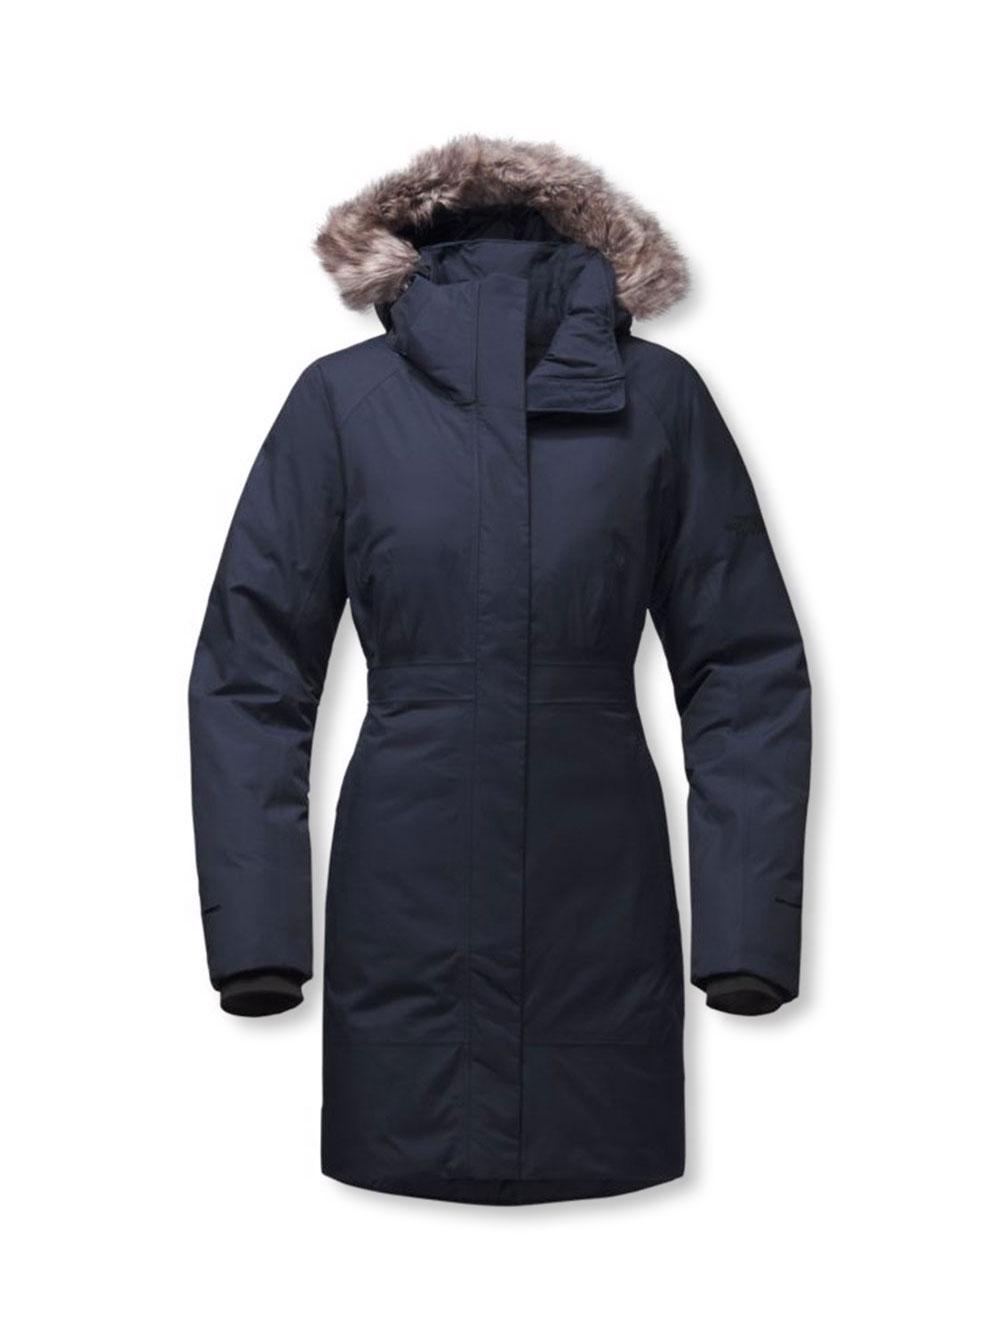 31d70e4d5 The North Face Women's Arctic Parka II (Sizes XS – XL)